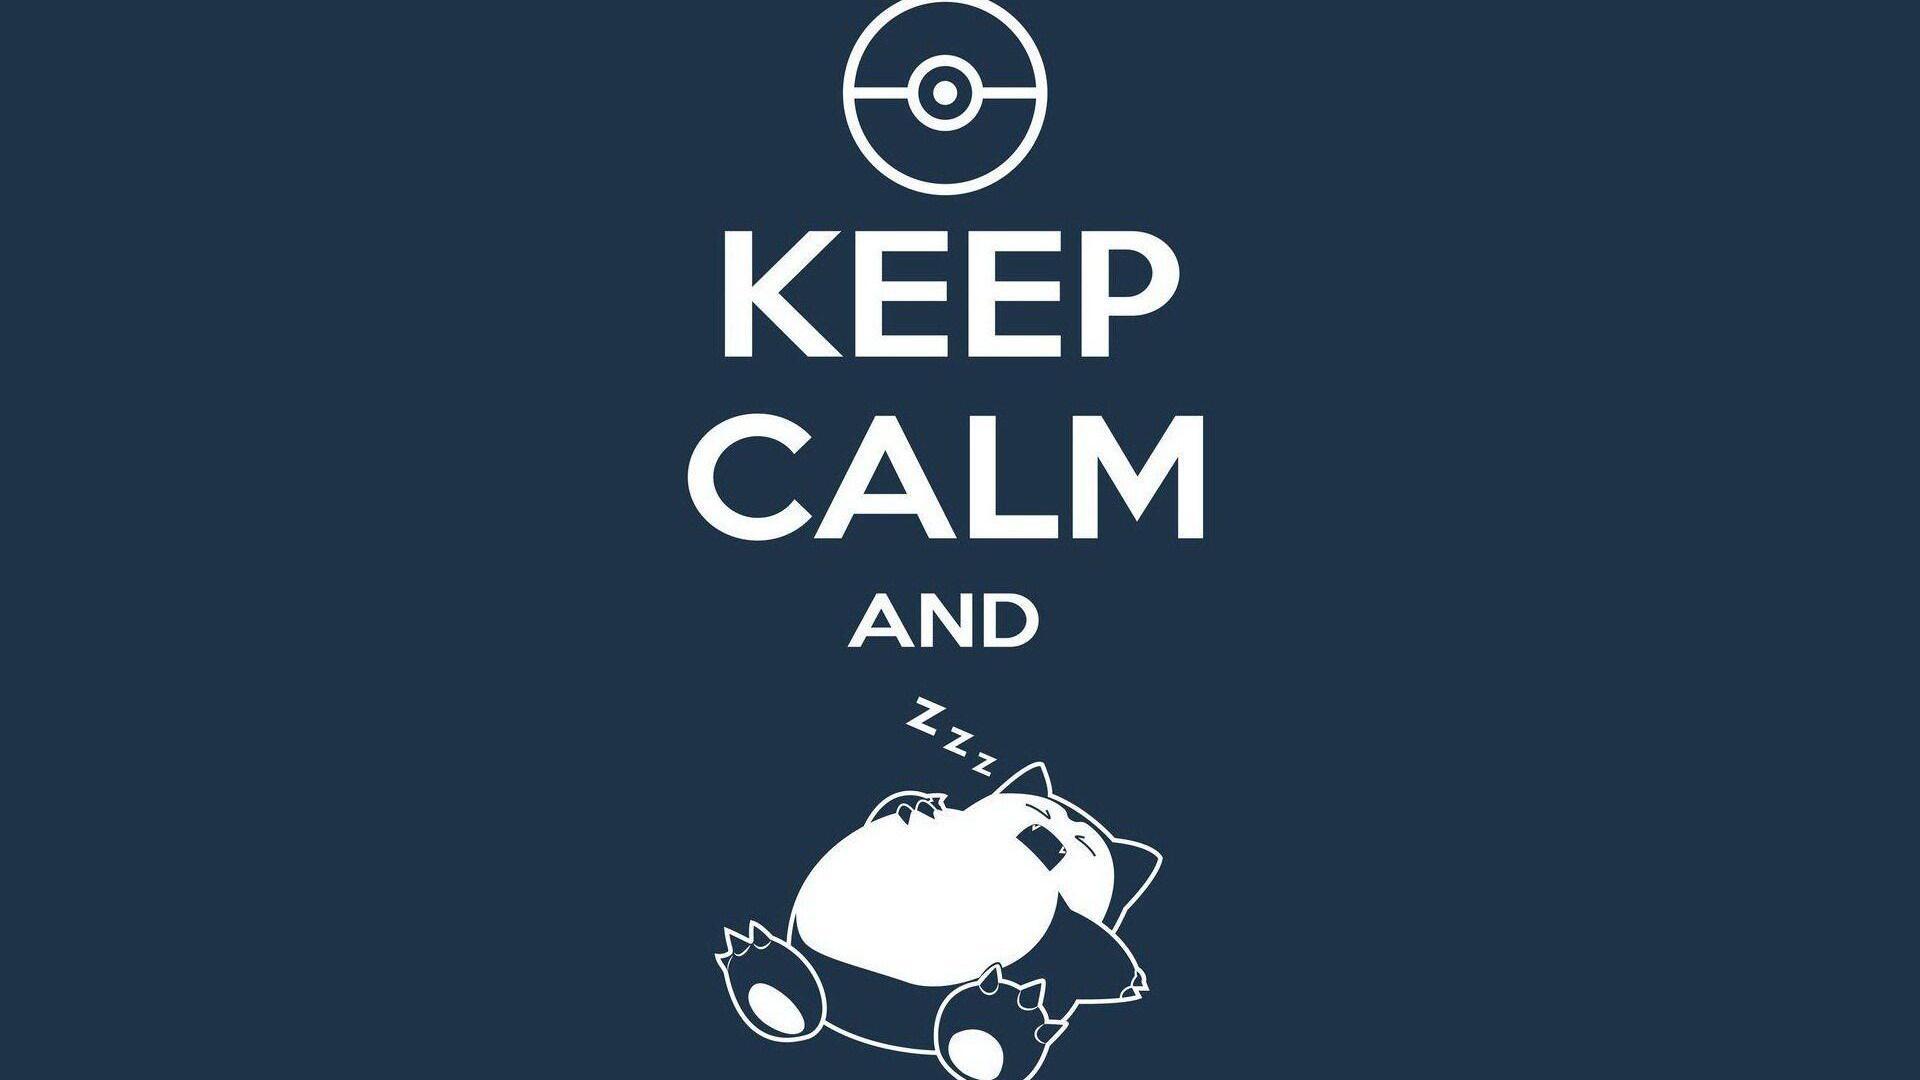 Cute Pokemon Wallpaper Wide 1920x1080 Keep Calm And Sleep Laptop Full Hd 1080p Hd 4k